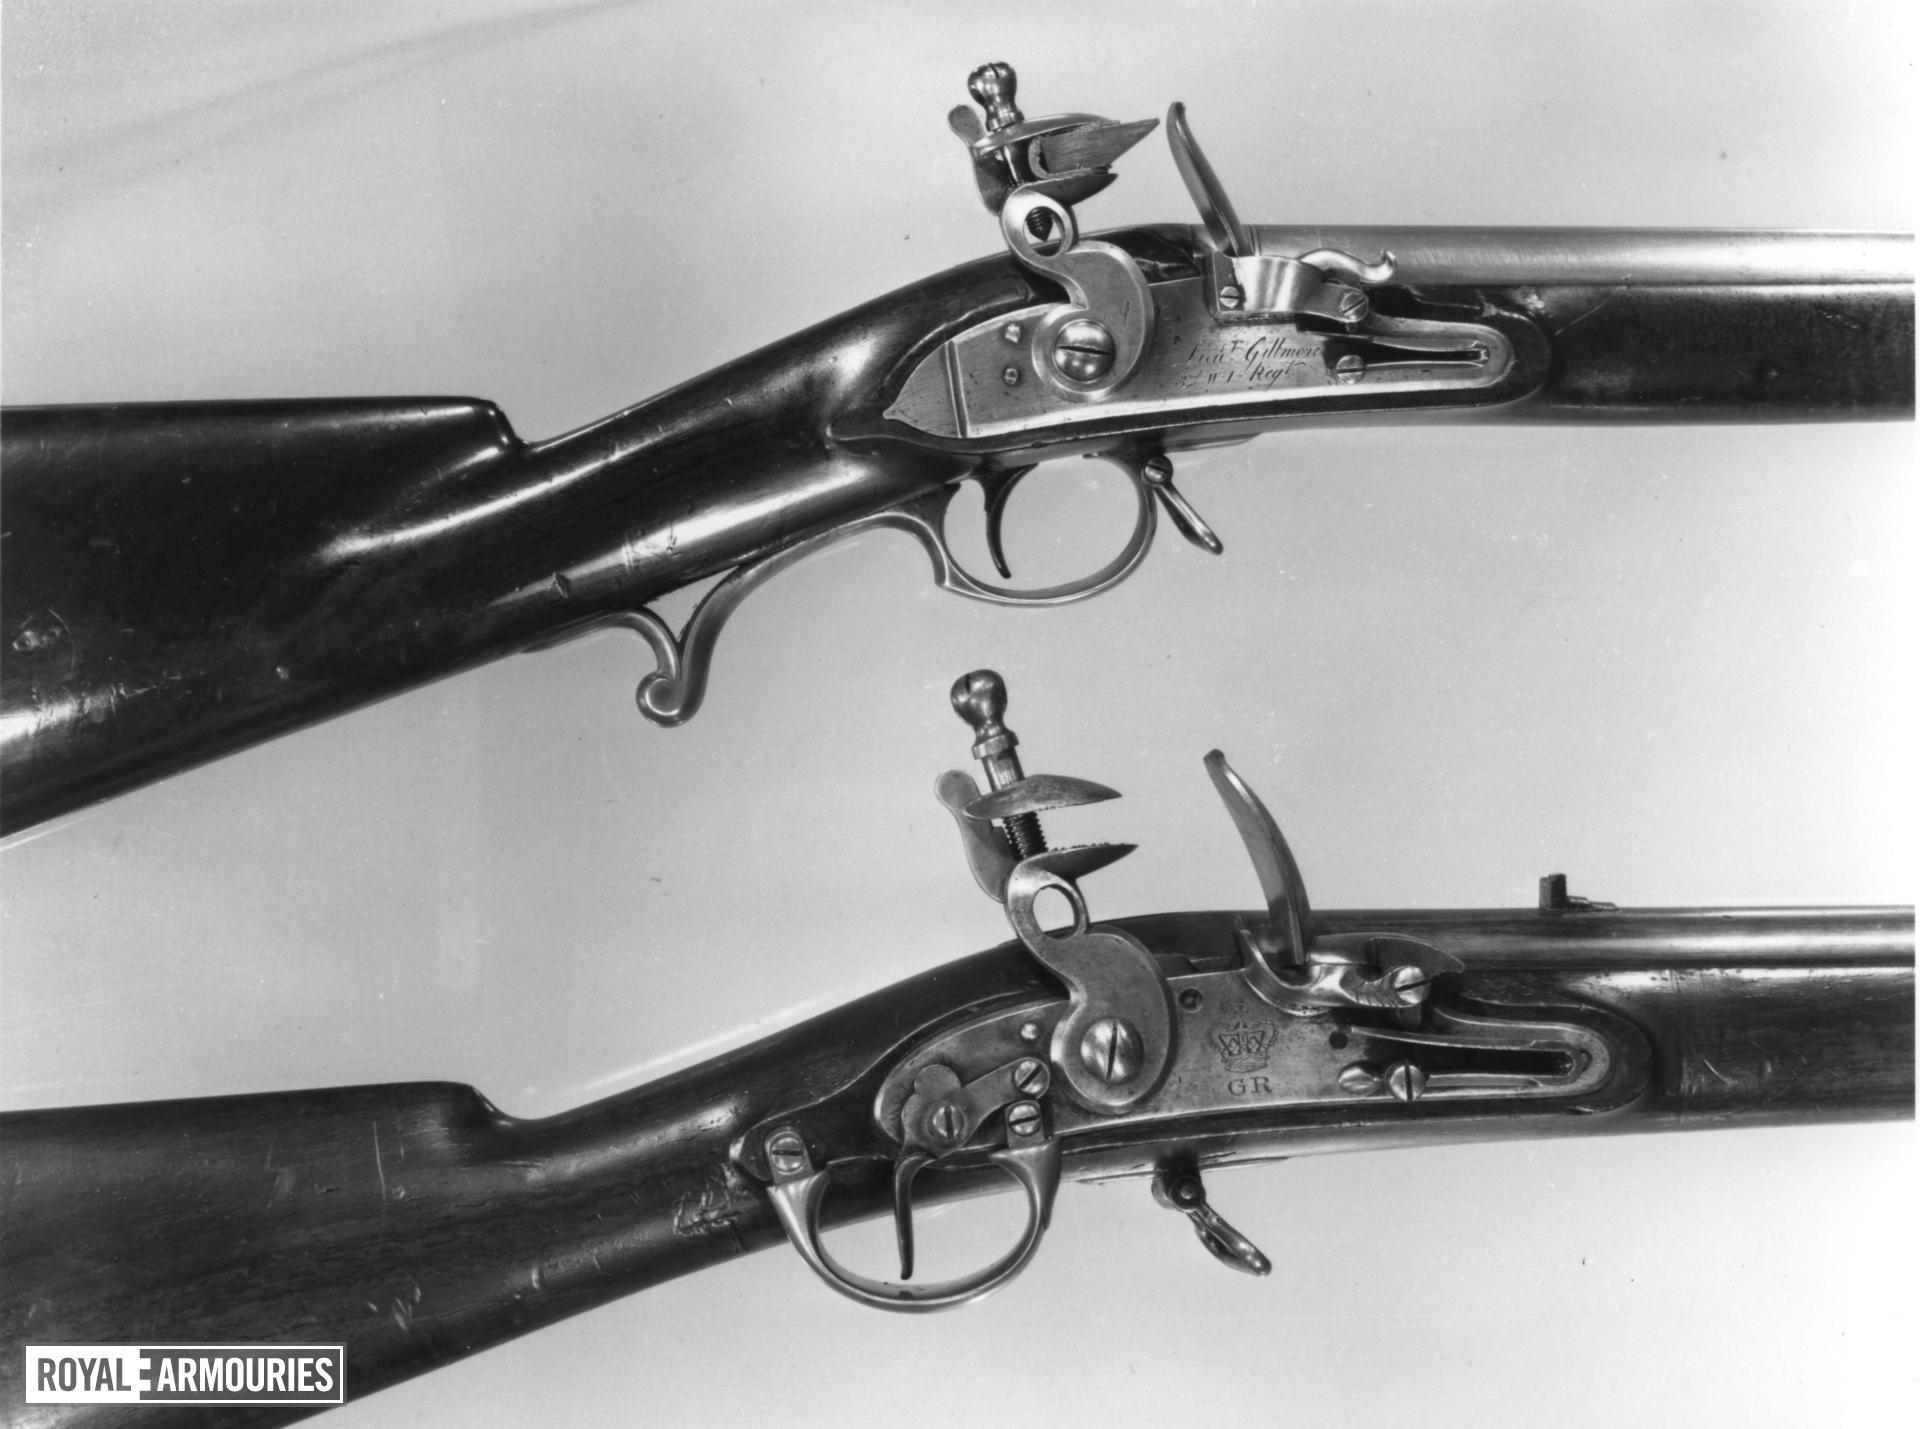 Flintlock muzzle-loading military musket - Gillmore's Pattern